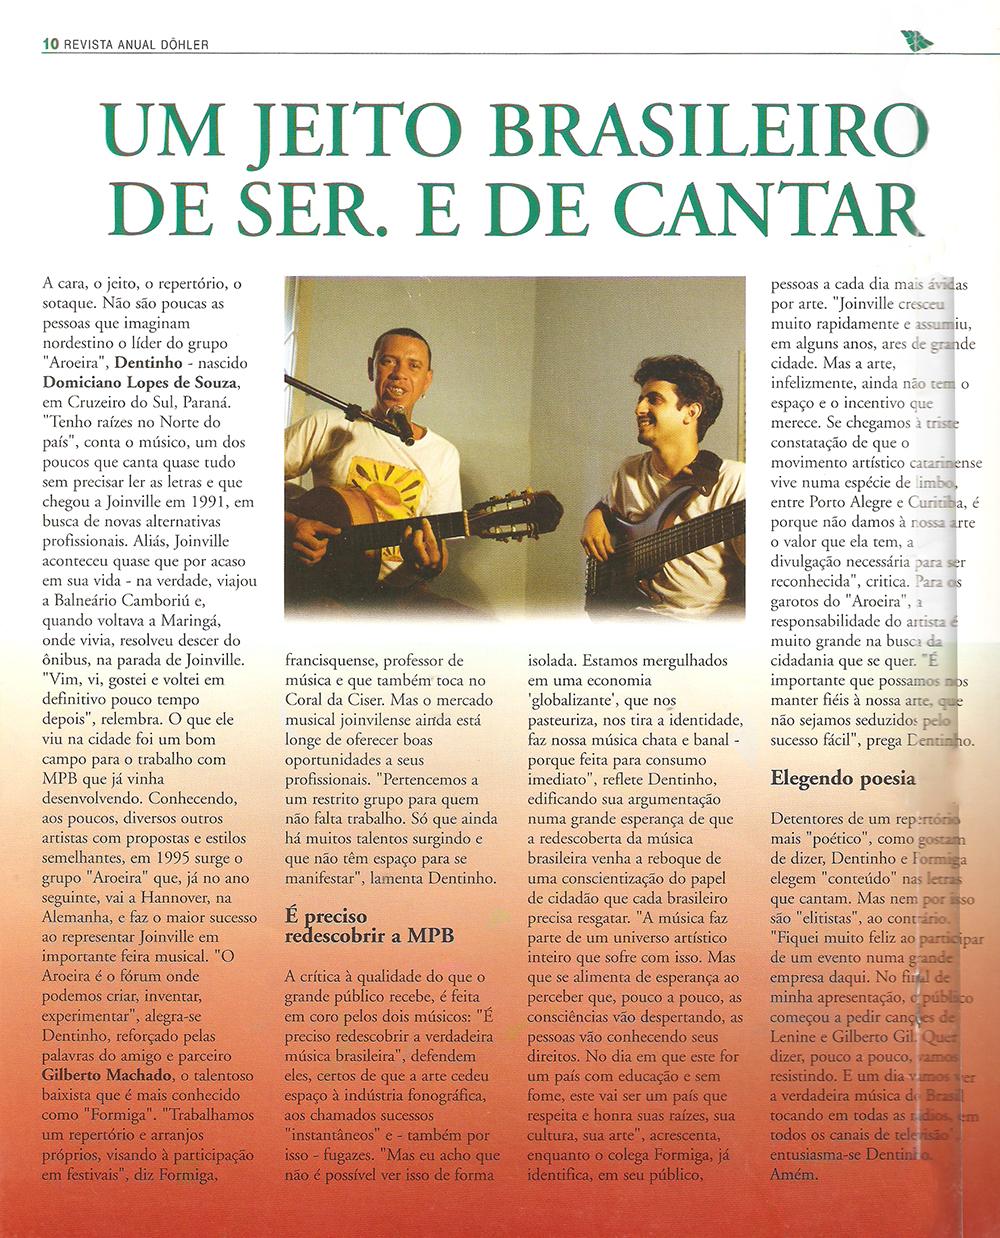 Revista anual Dohler - 2002